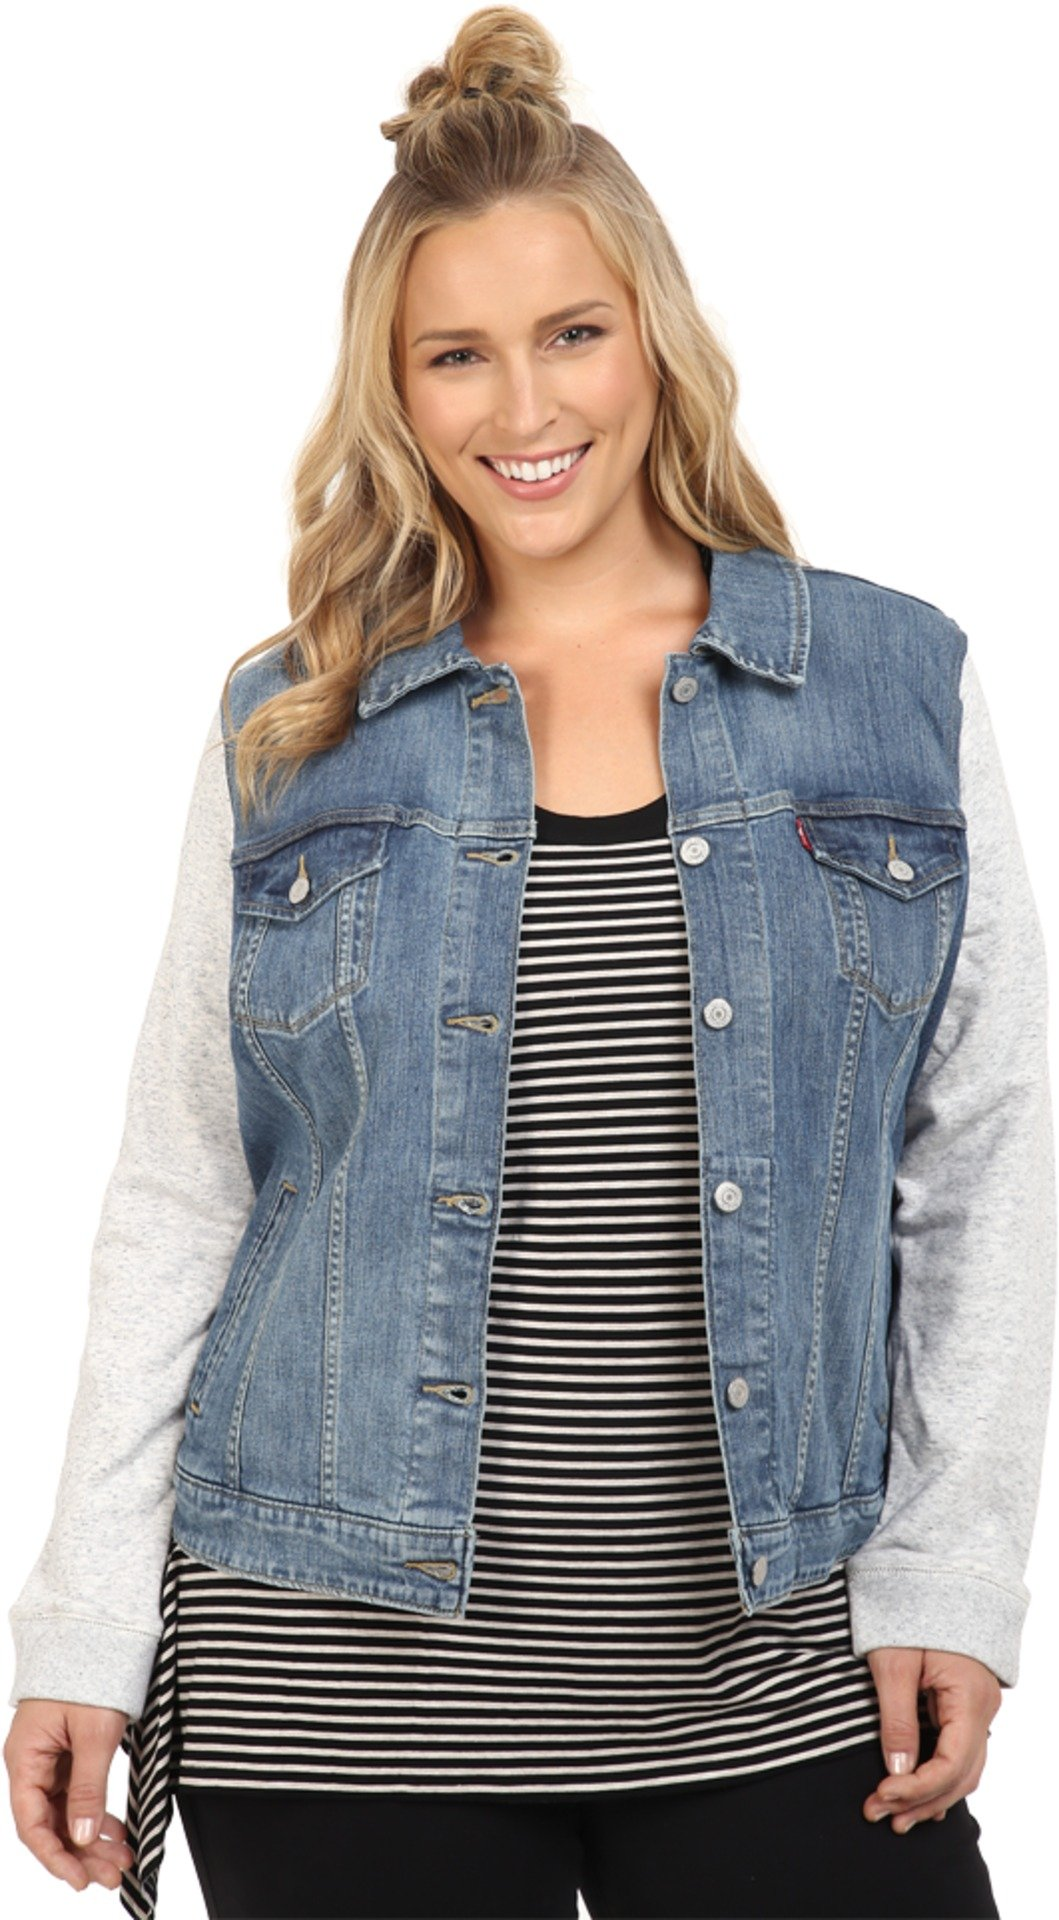 Levi's Women's Plus-Size Trucker Jacket, Ocean Sail, 2X